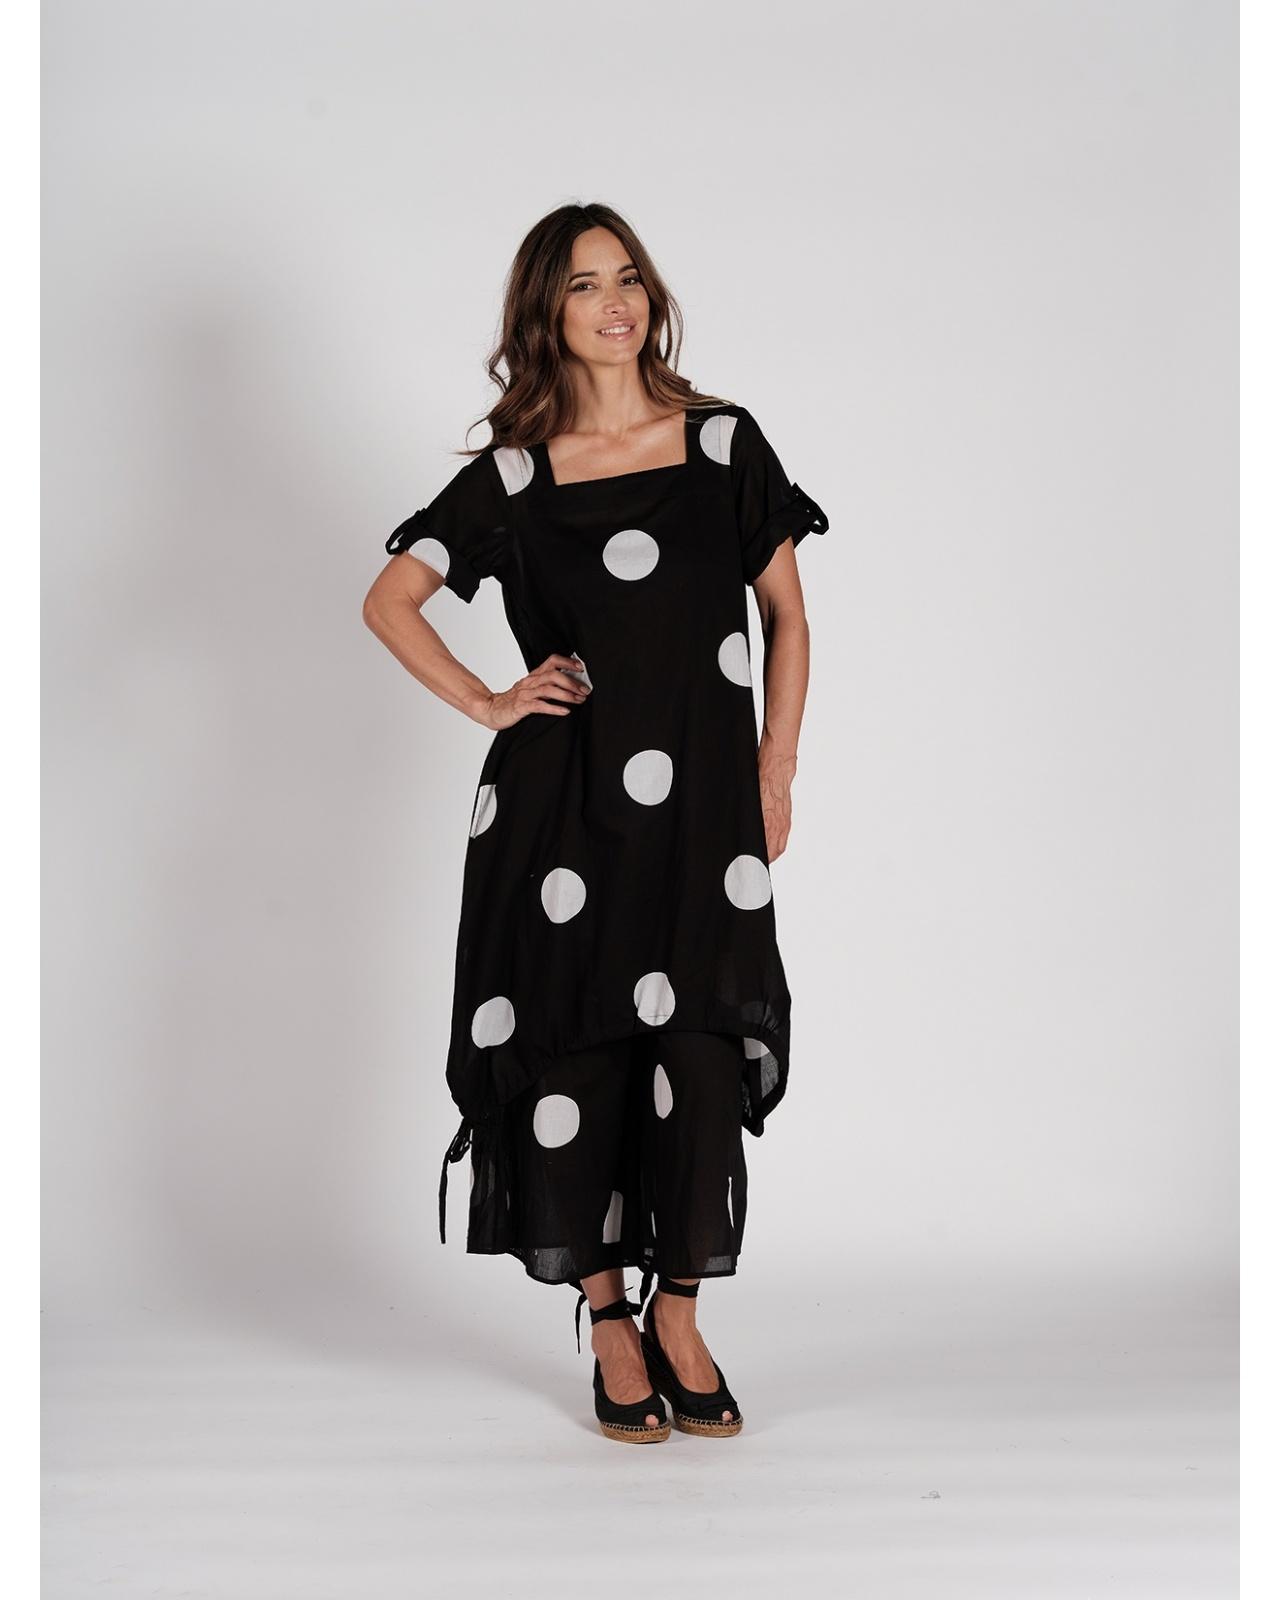 DRESS MONT VENTOUX N°7 BLACK/WHITE